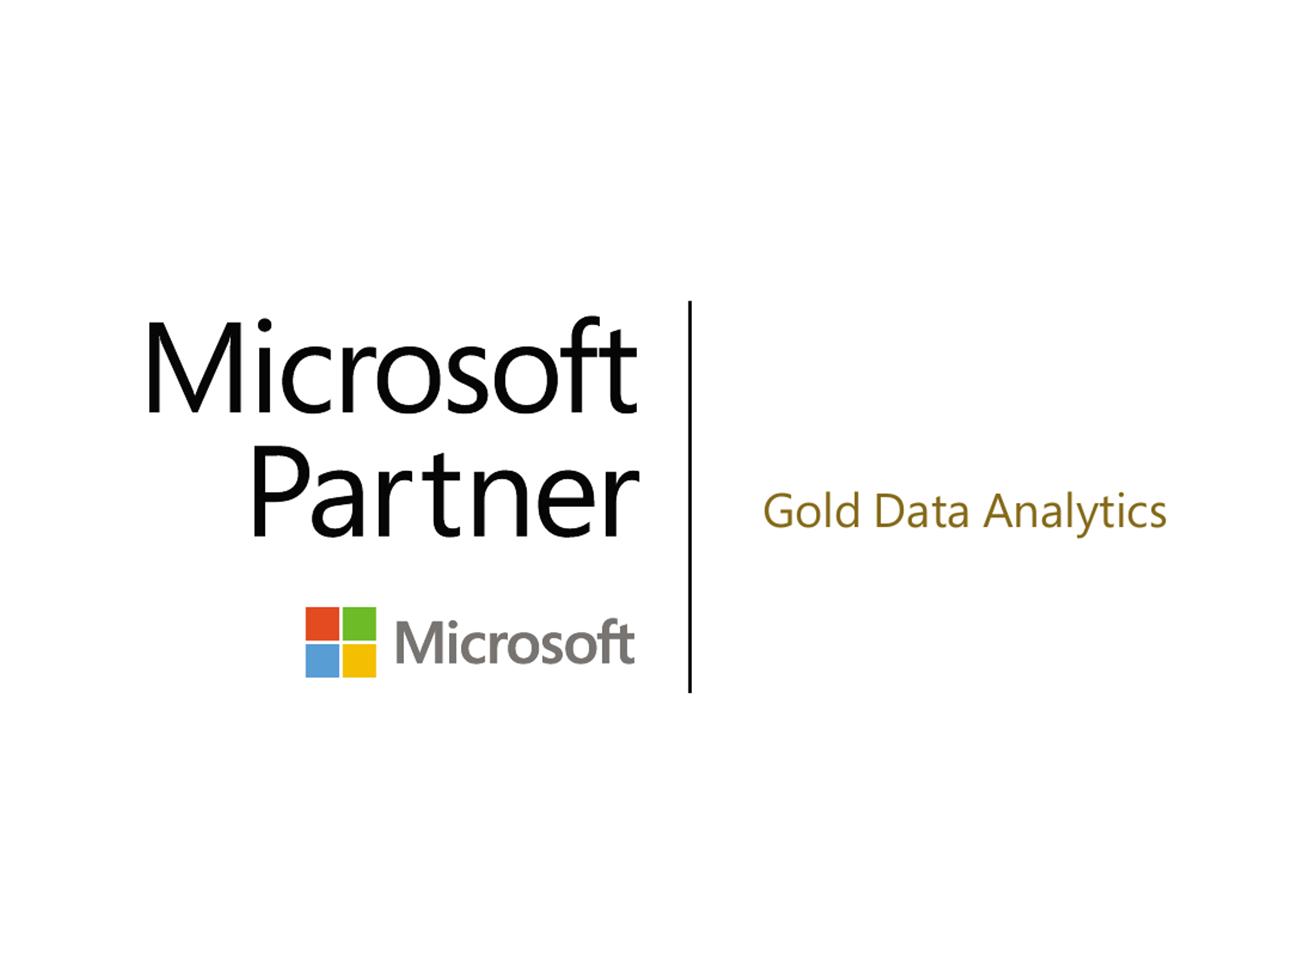 Beltel Datanomics получил золото от Microsoft